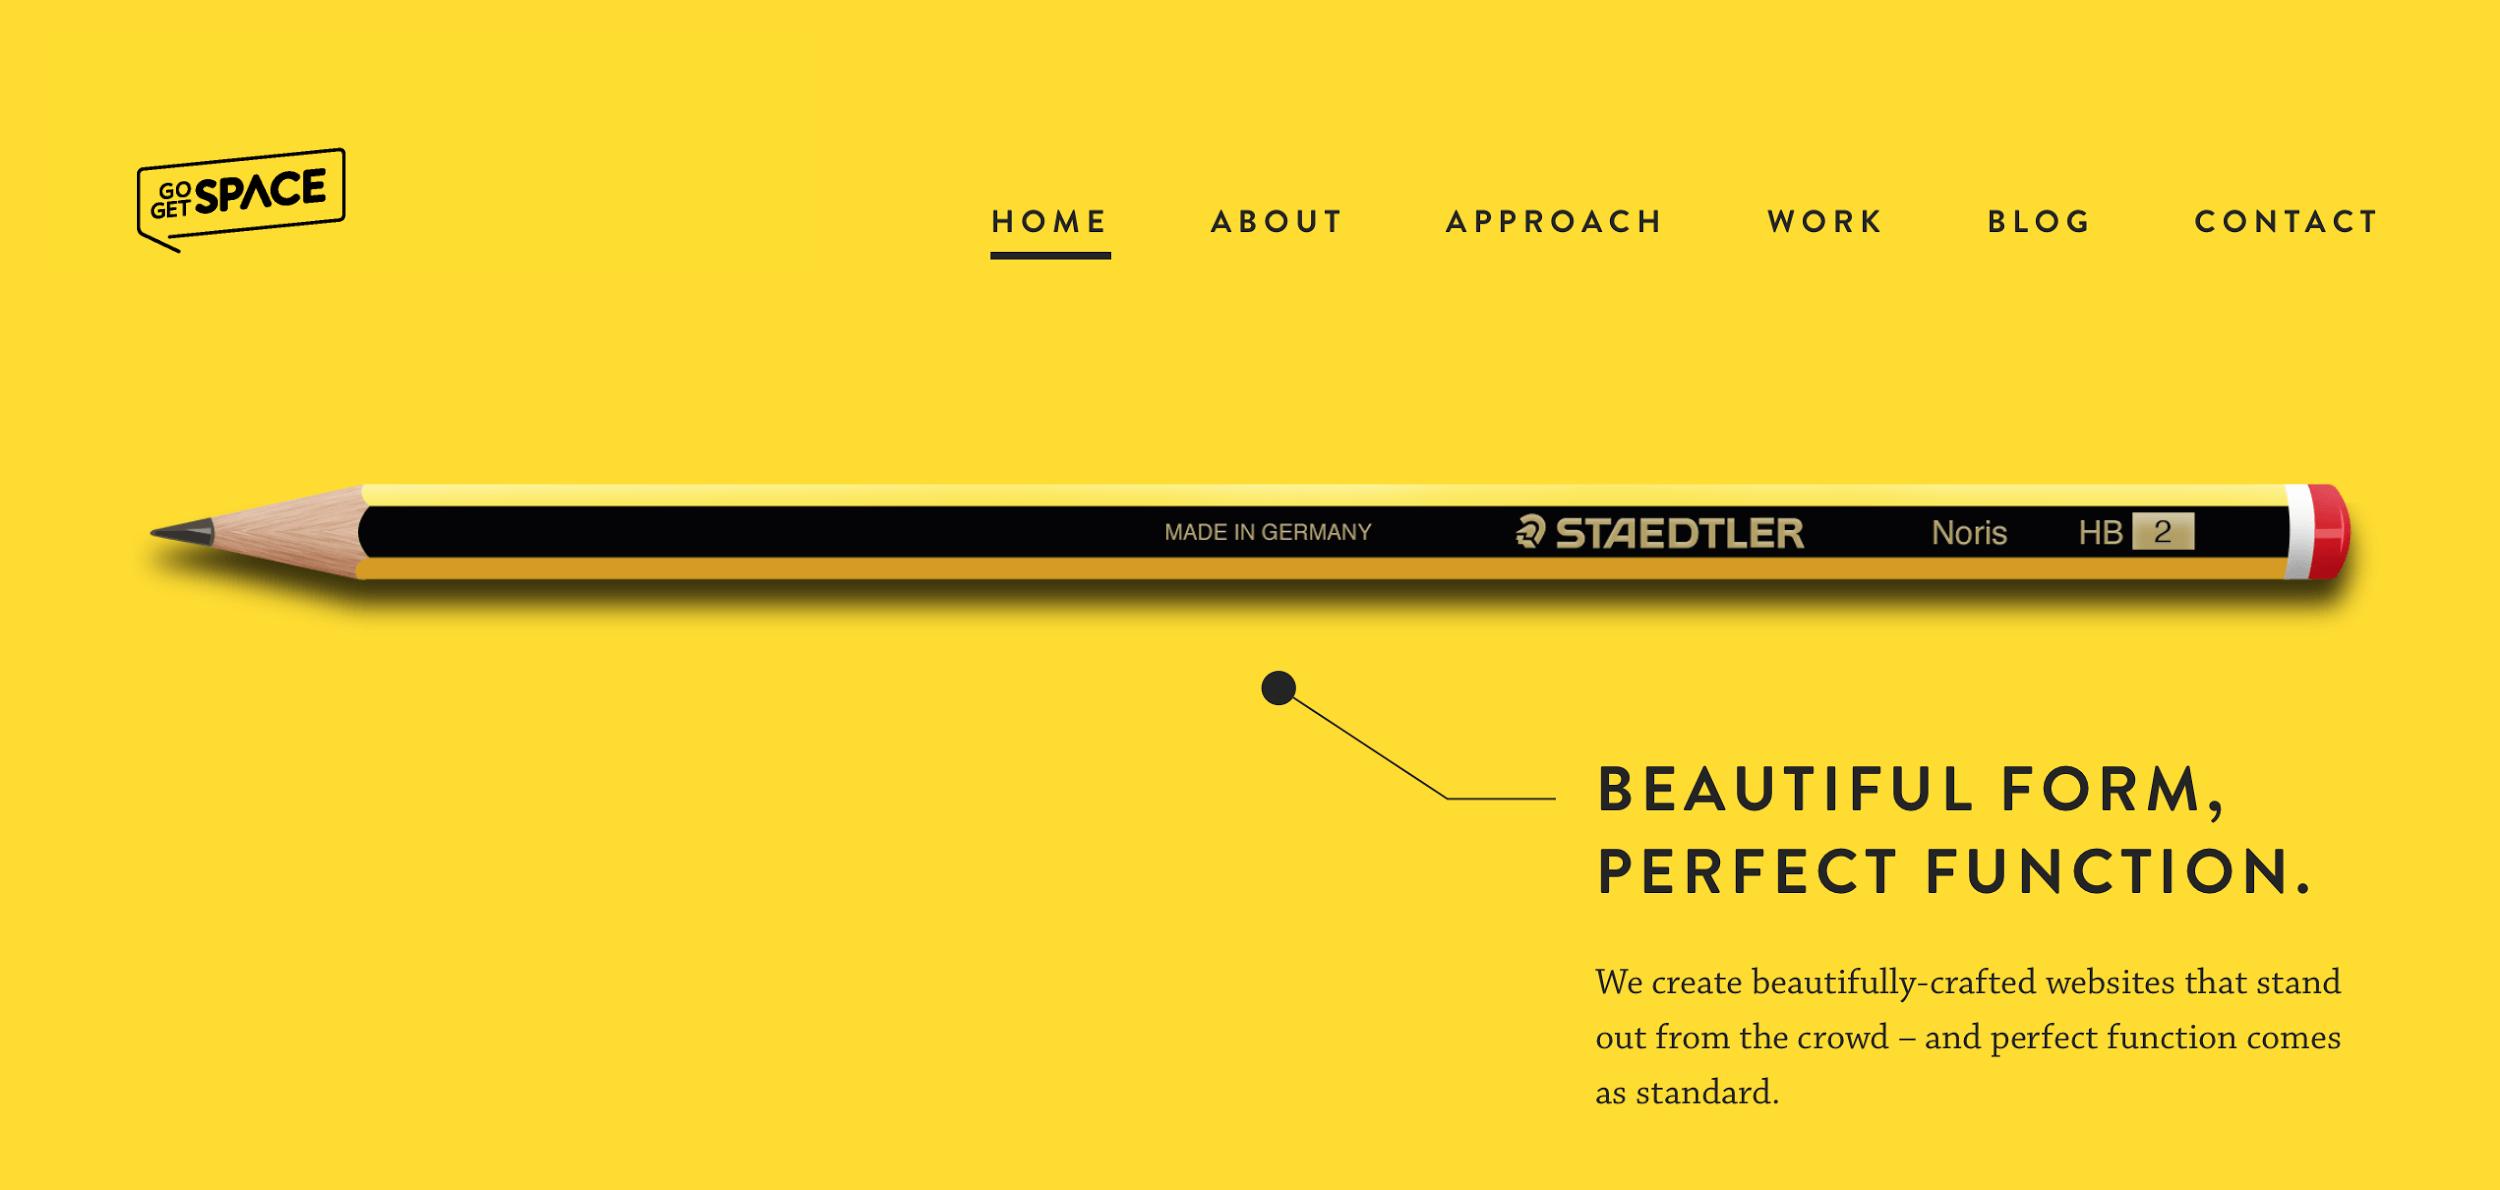 Minimalism for web design